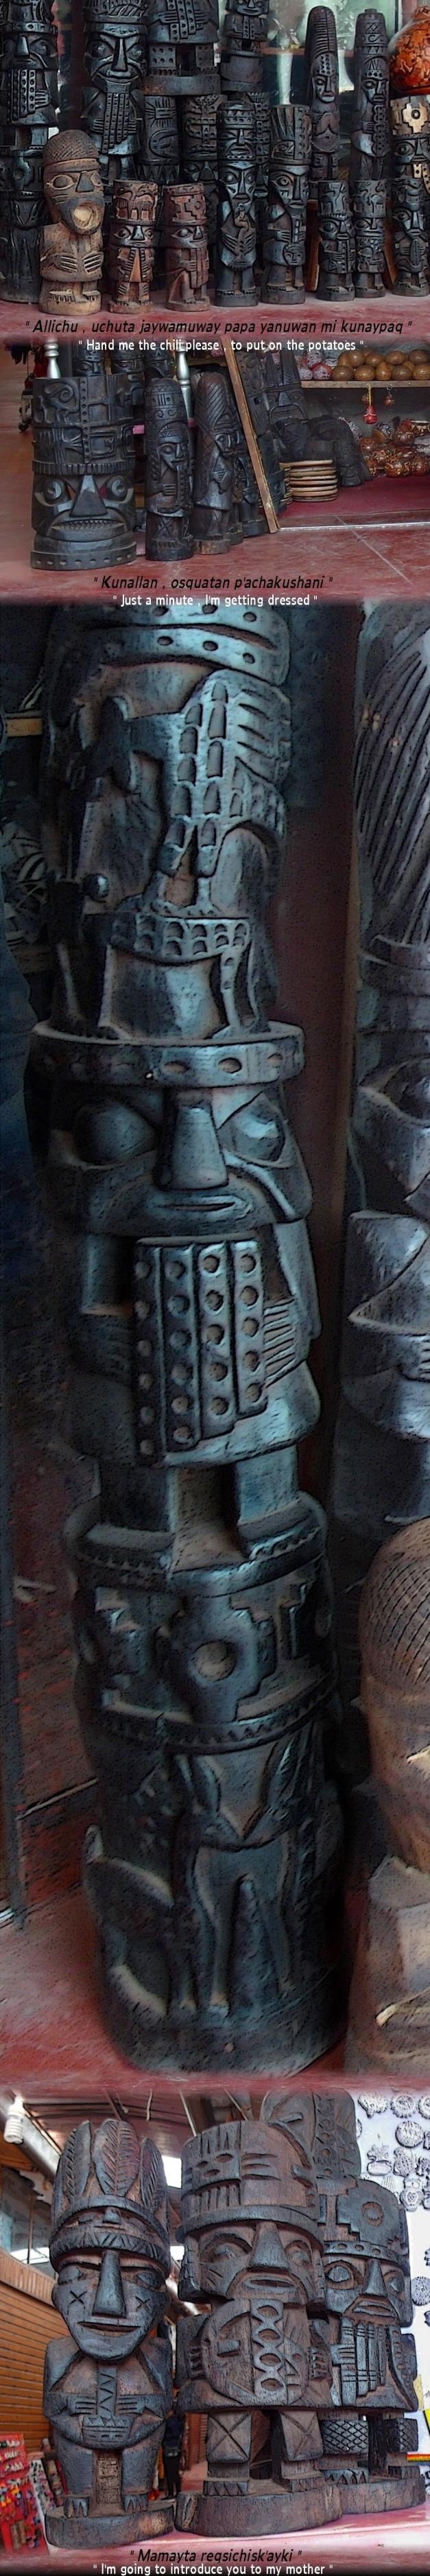 Cuzco-10bz